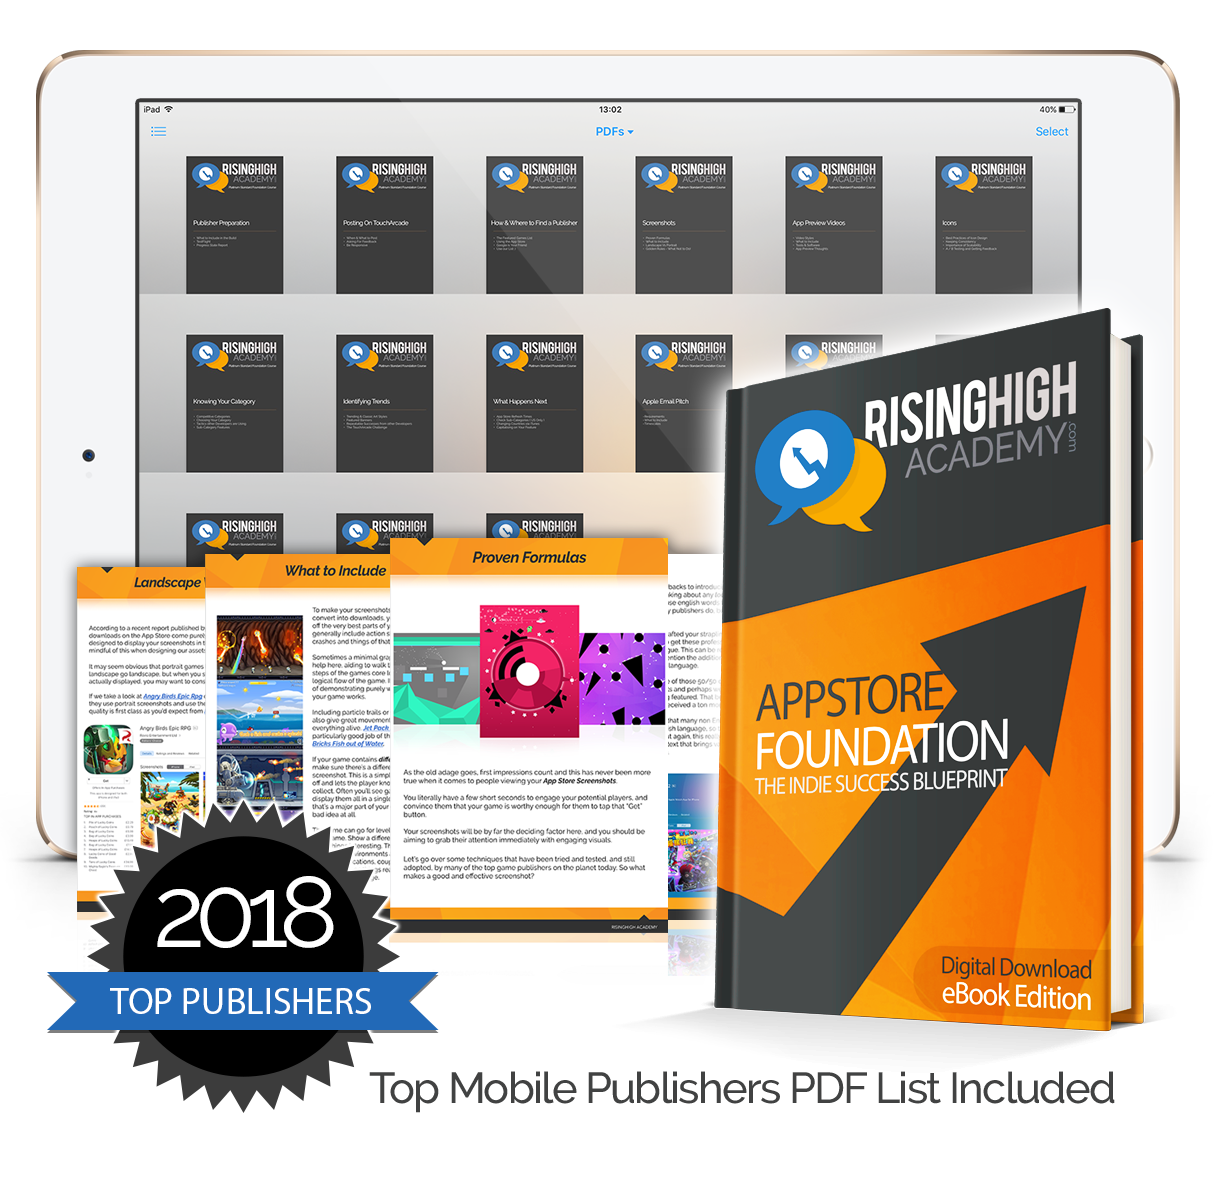 Appstore Foundation eBook 2018